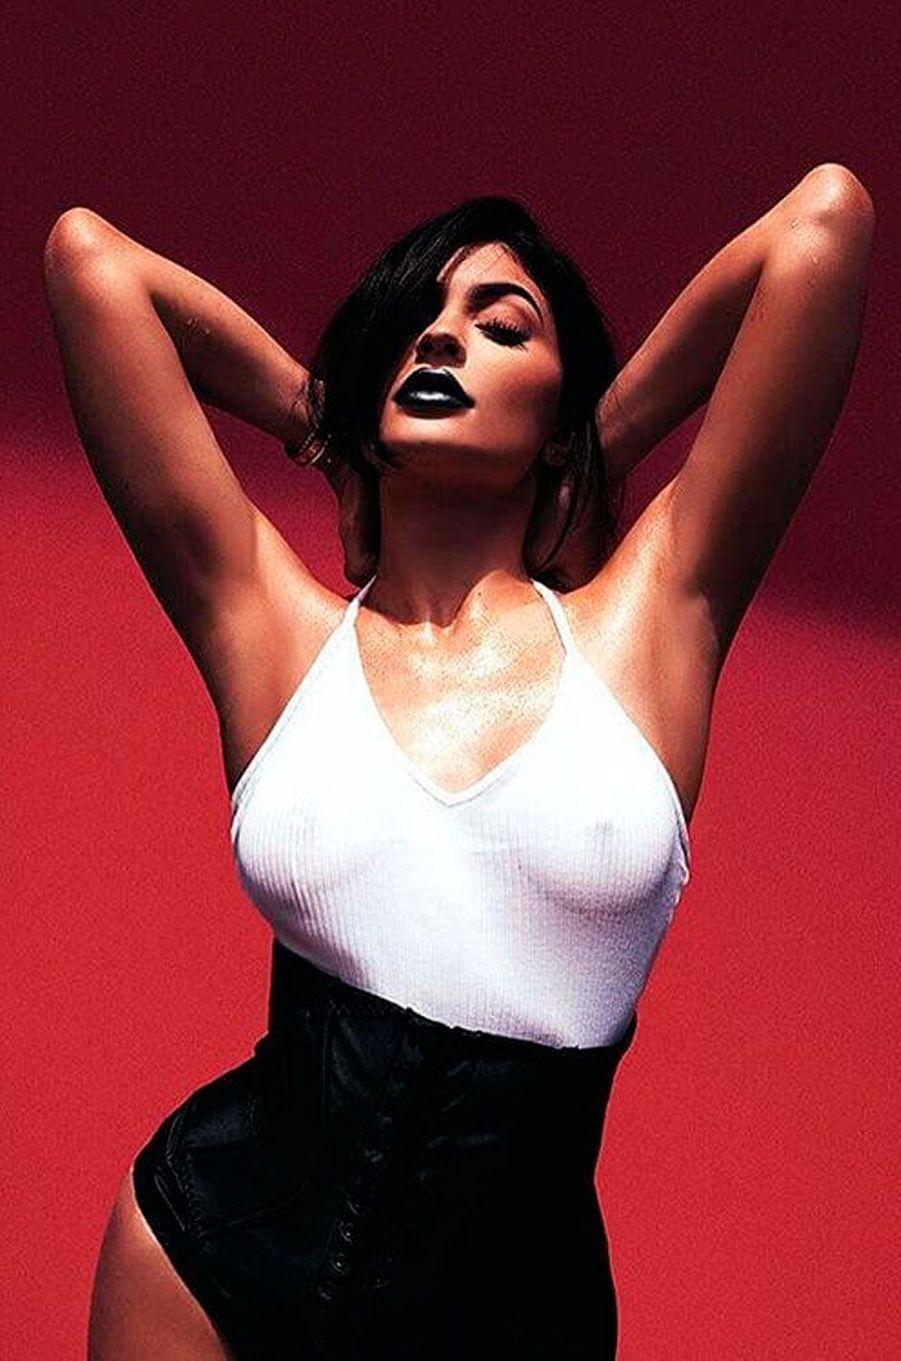 Kylie Jenner est la dernière du clan Kardashian